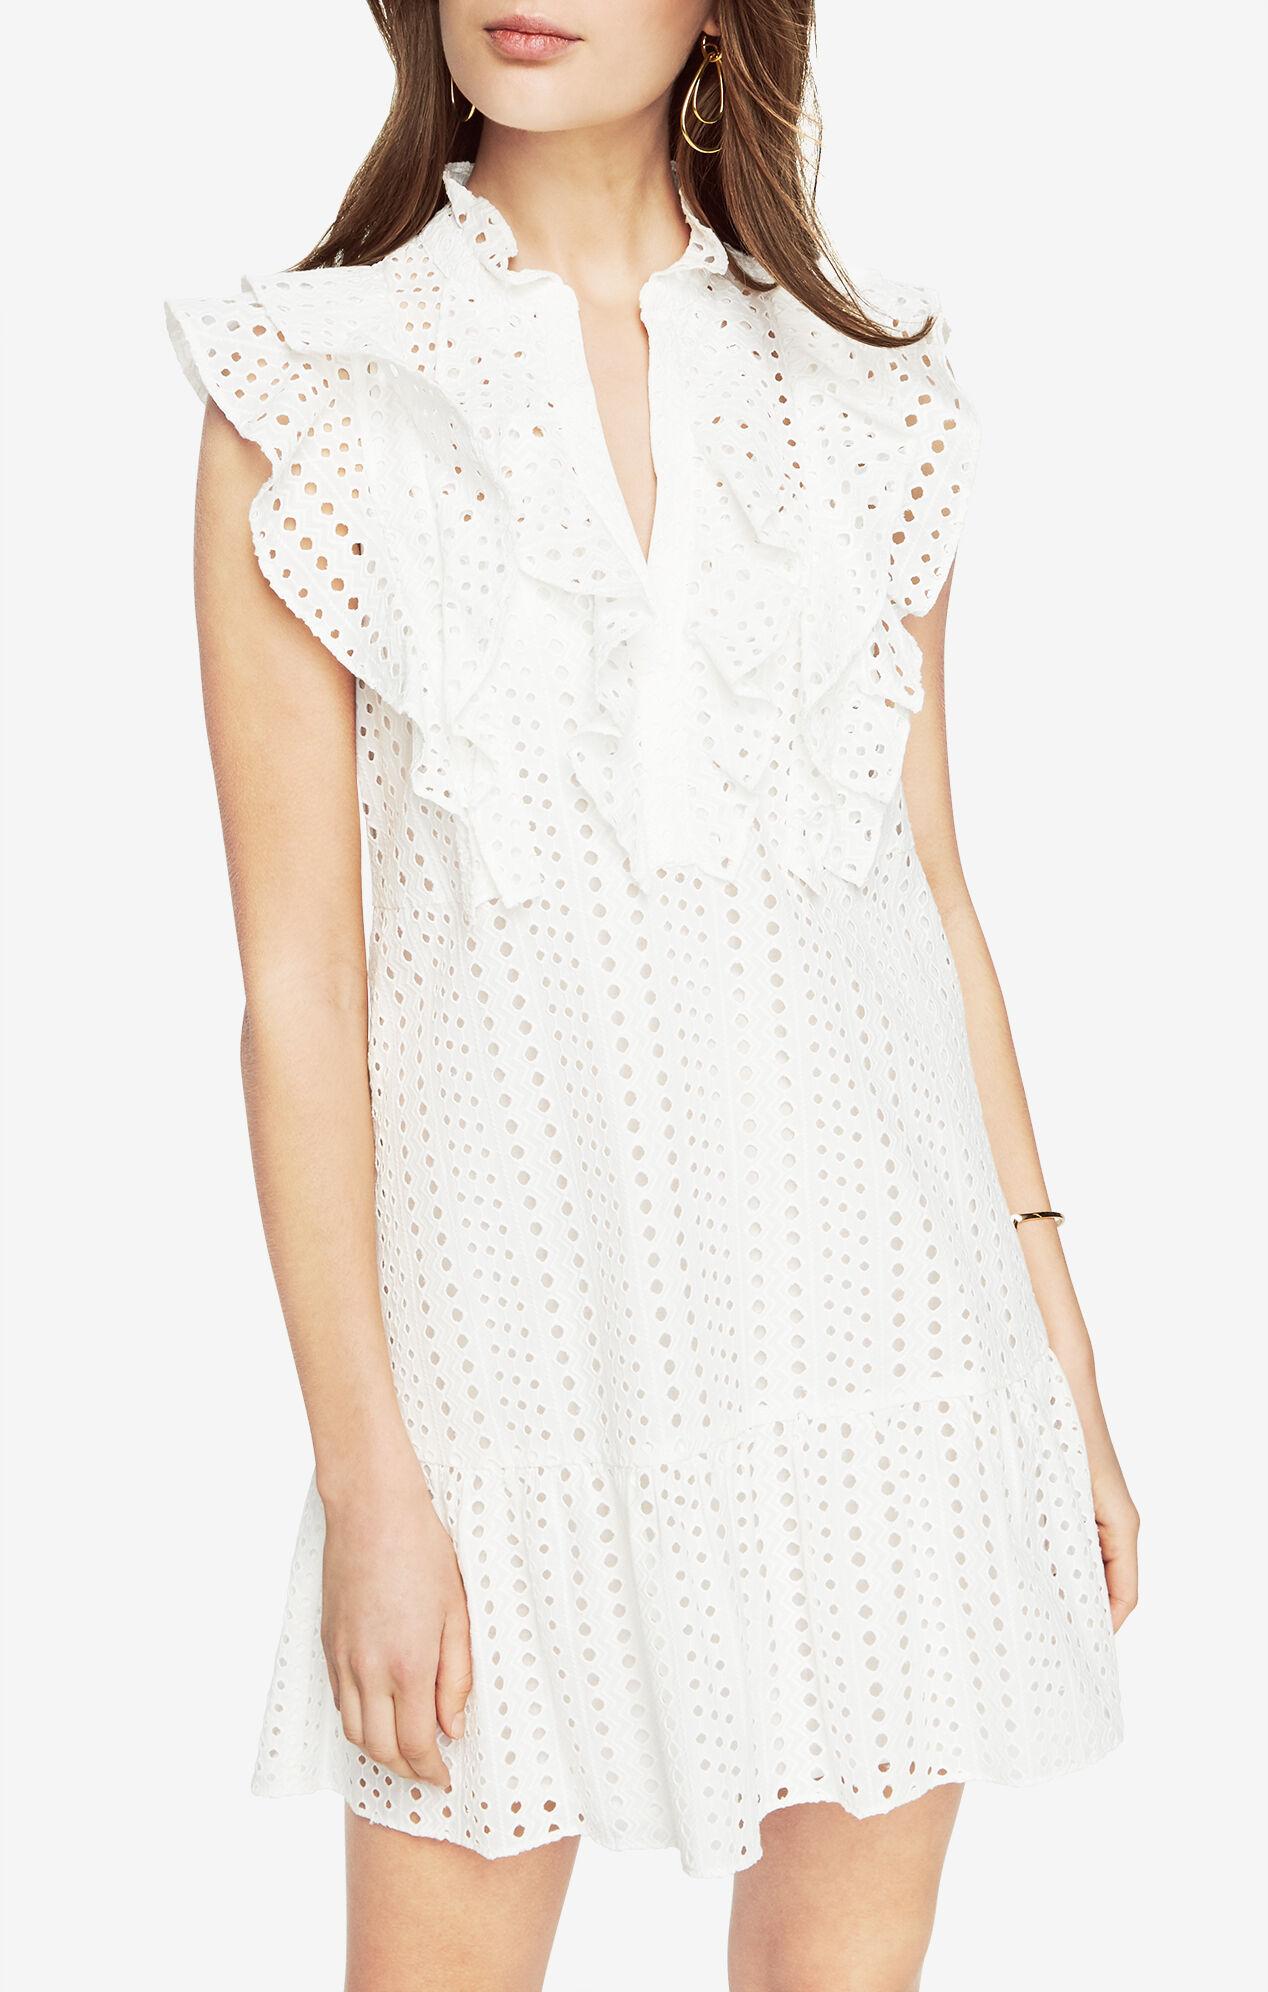 White dress cocktail - Alicia Ruffled Eyelet Dress